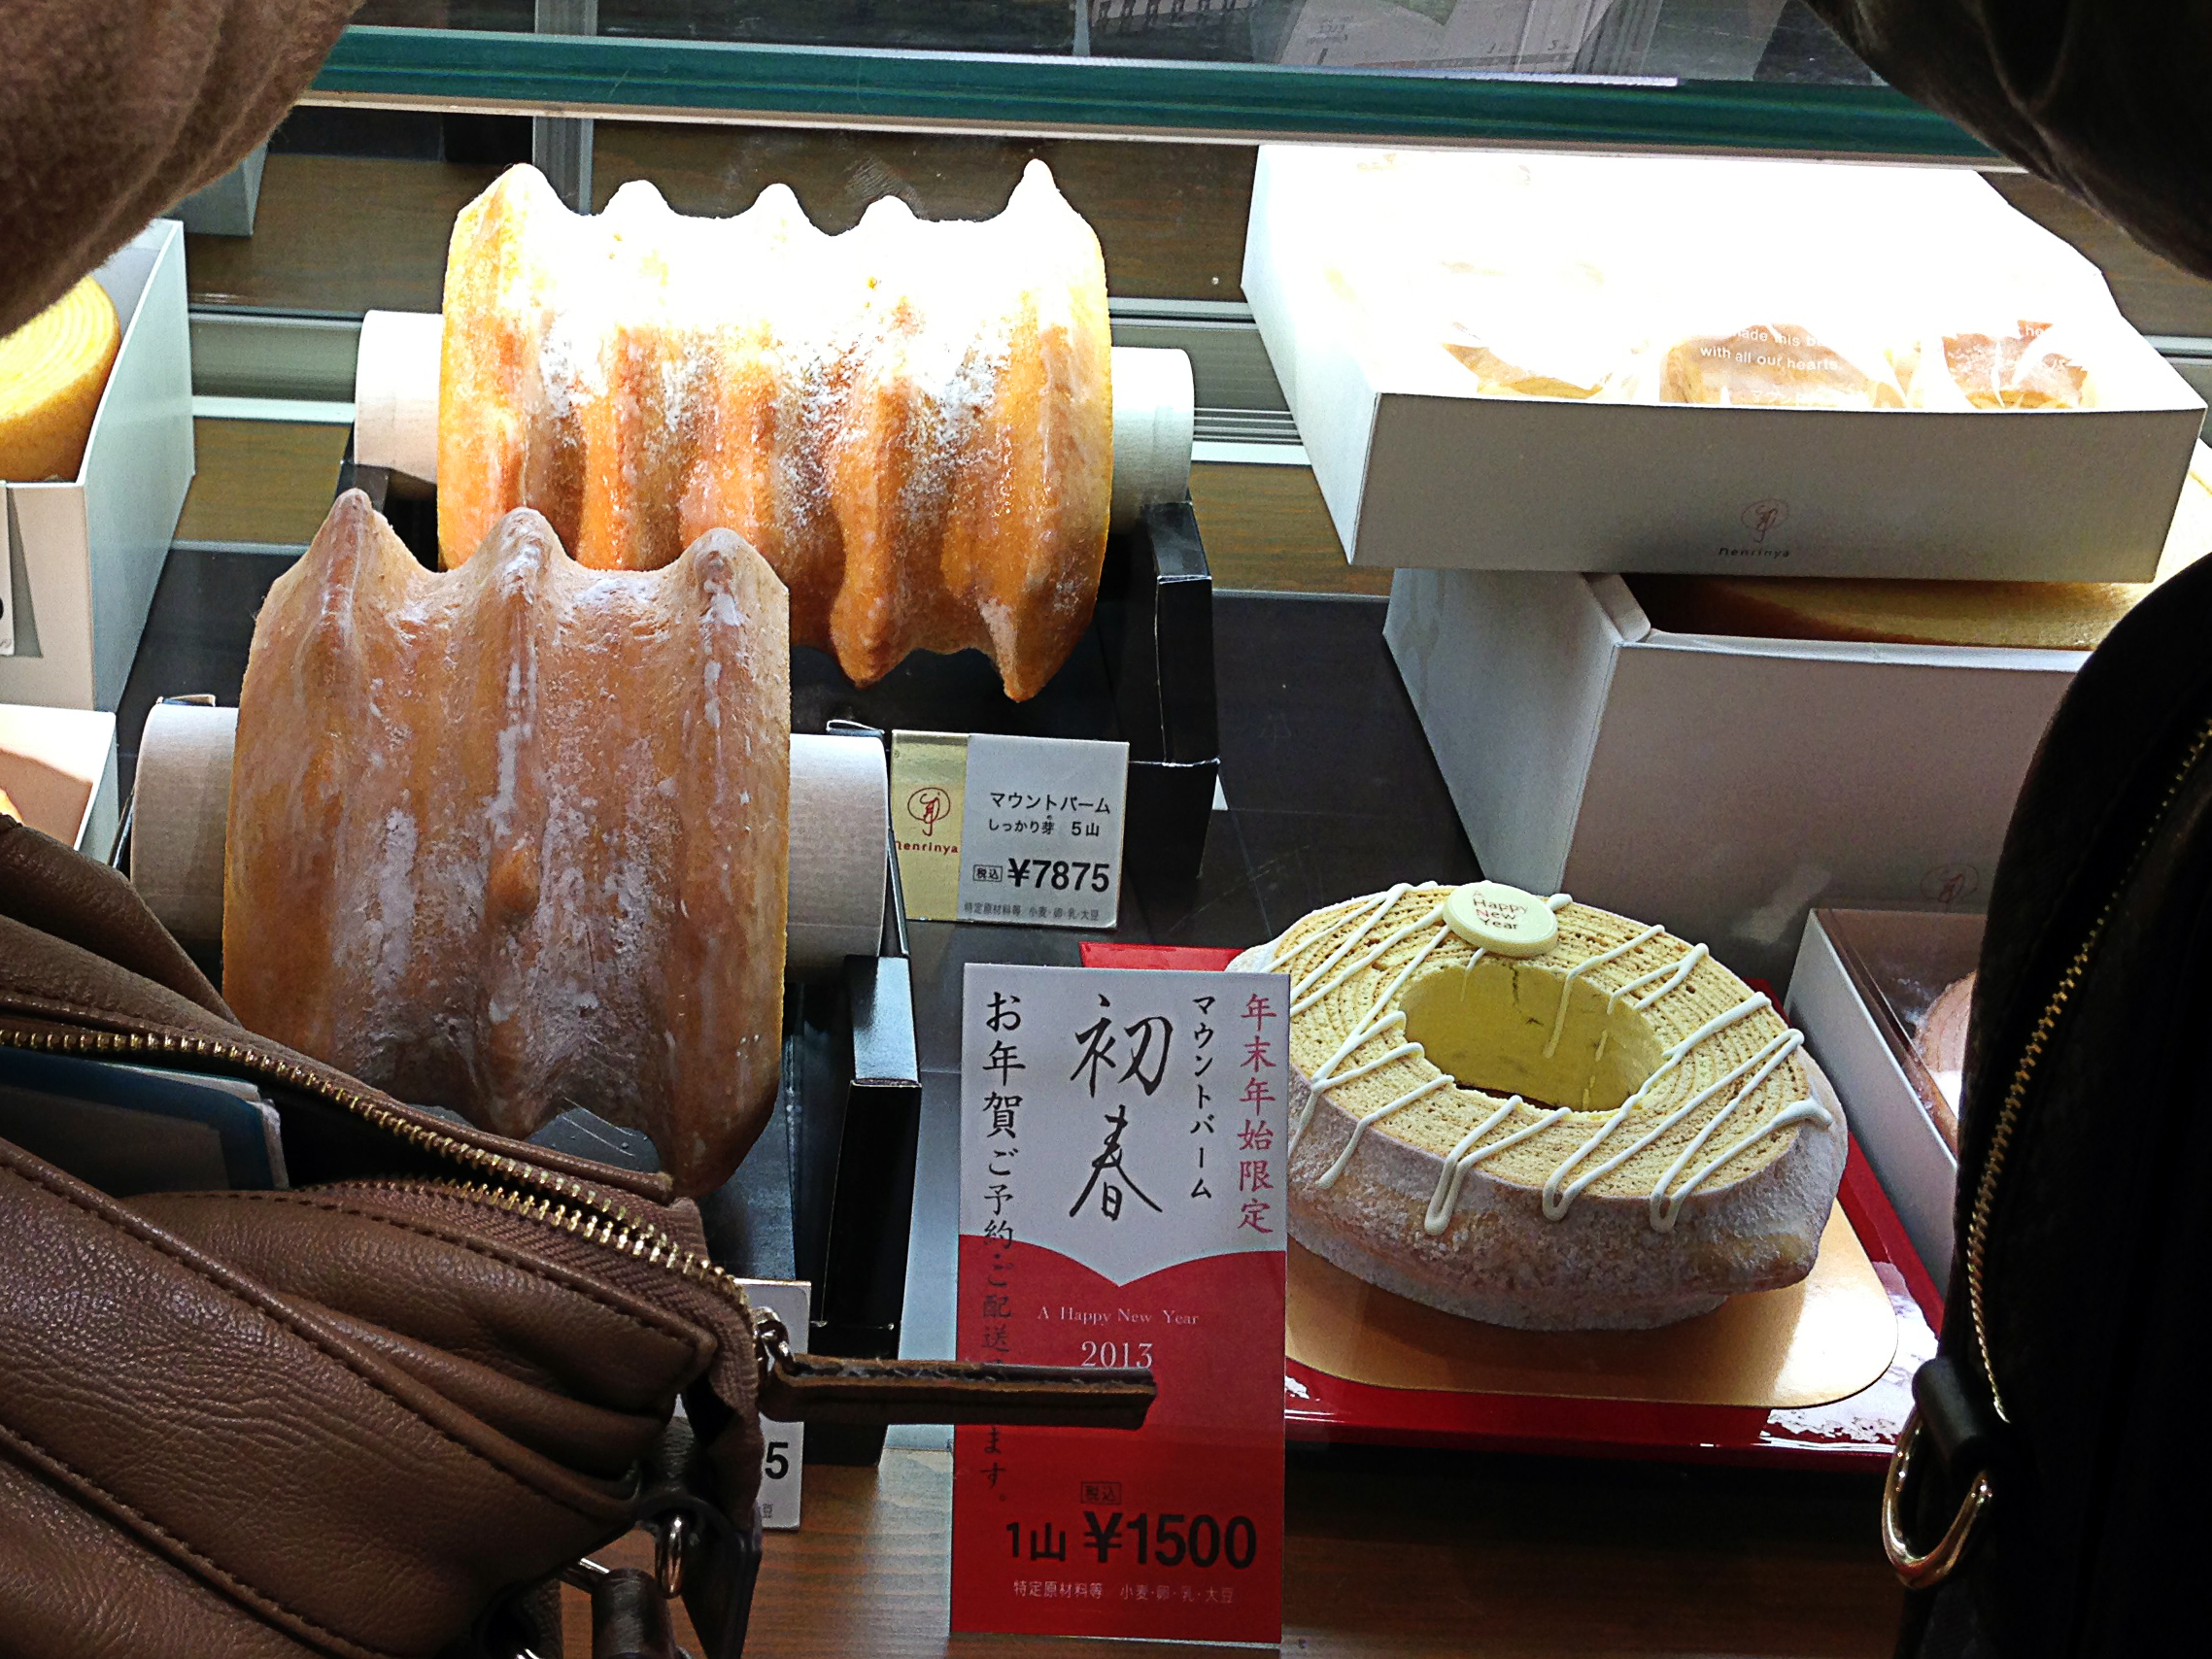 Baumkuchen display at Nenrinya in Tokyo. Photo by alphacityguides.